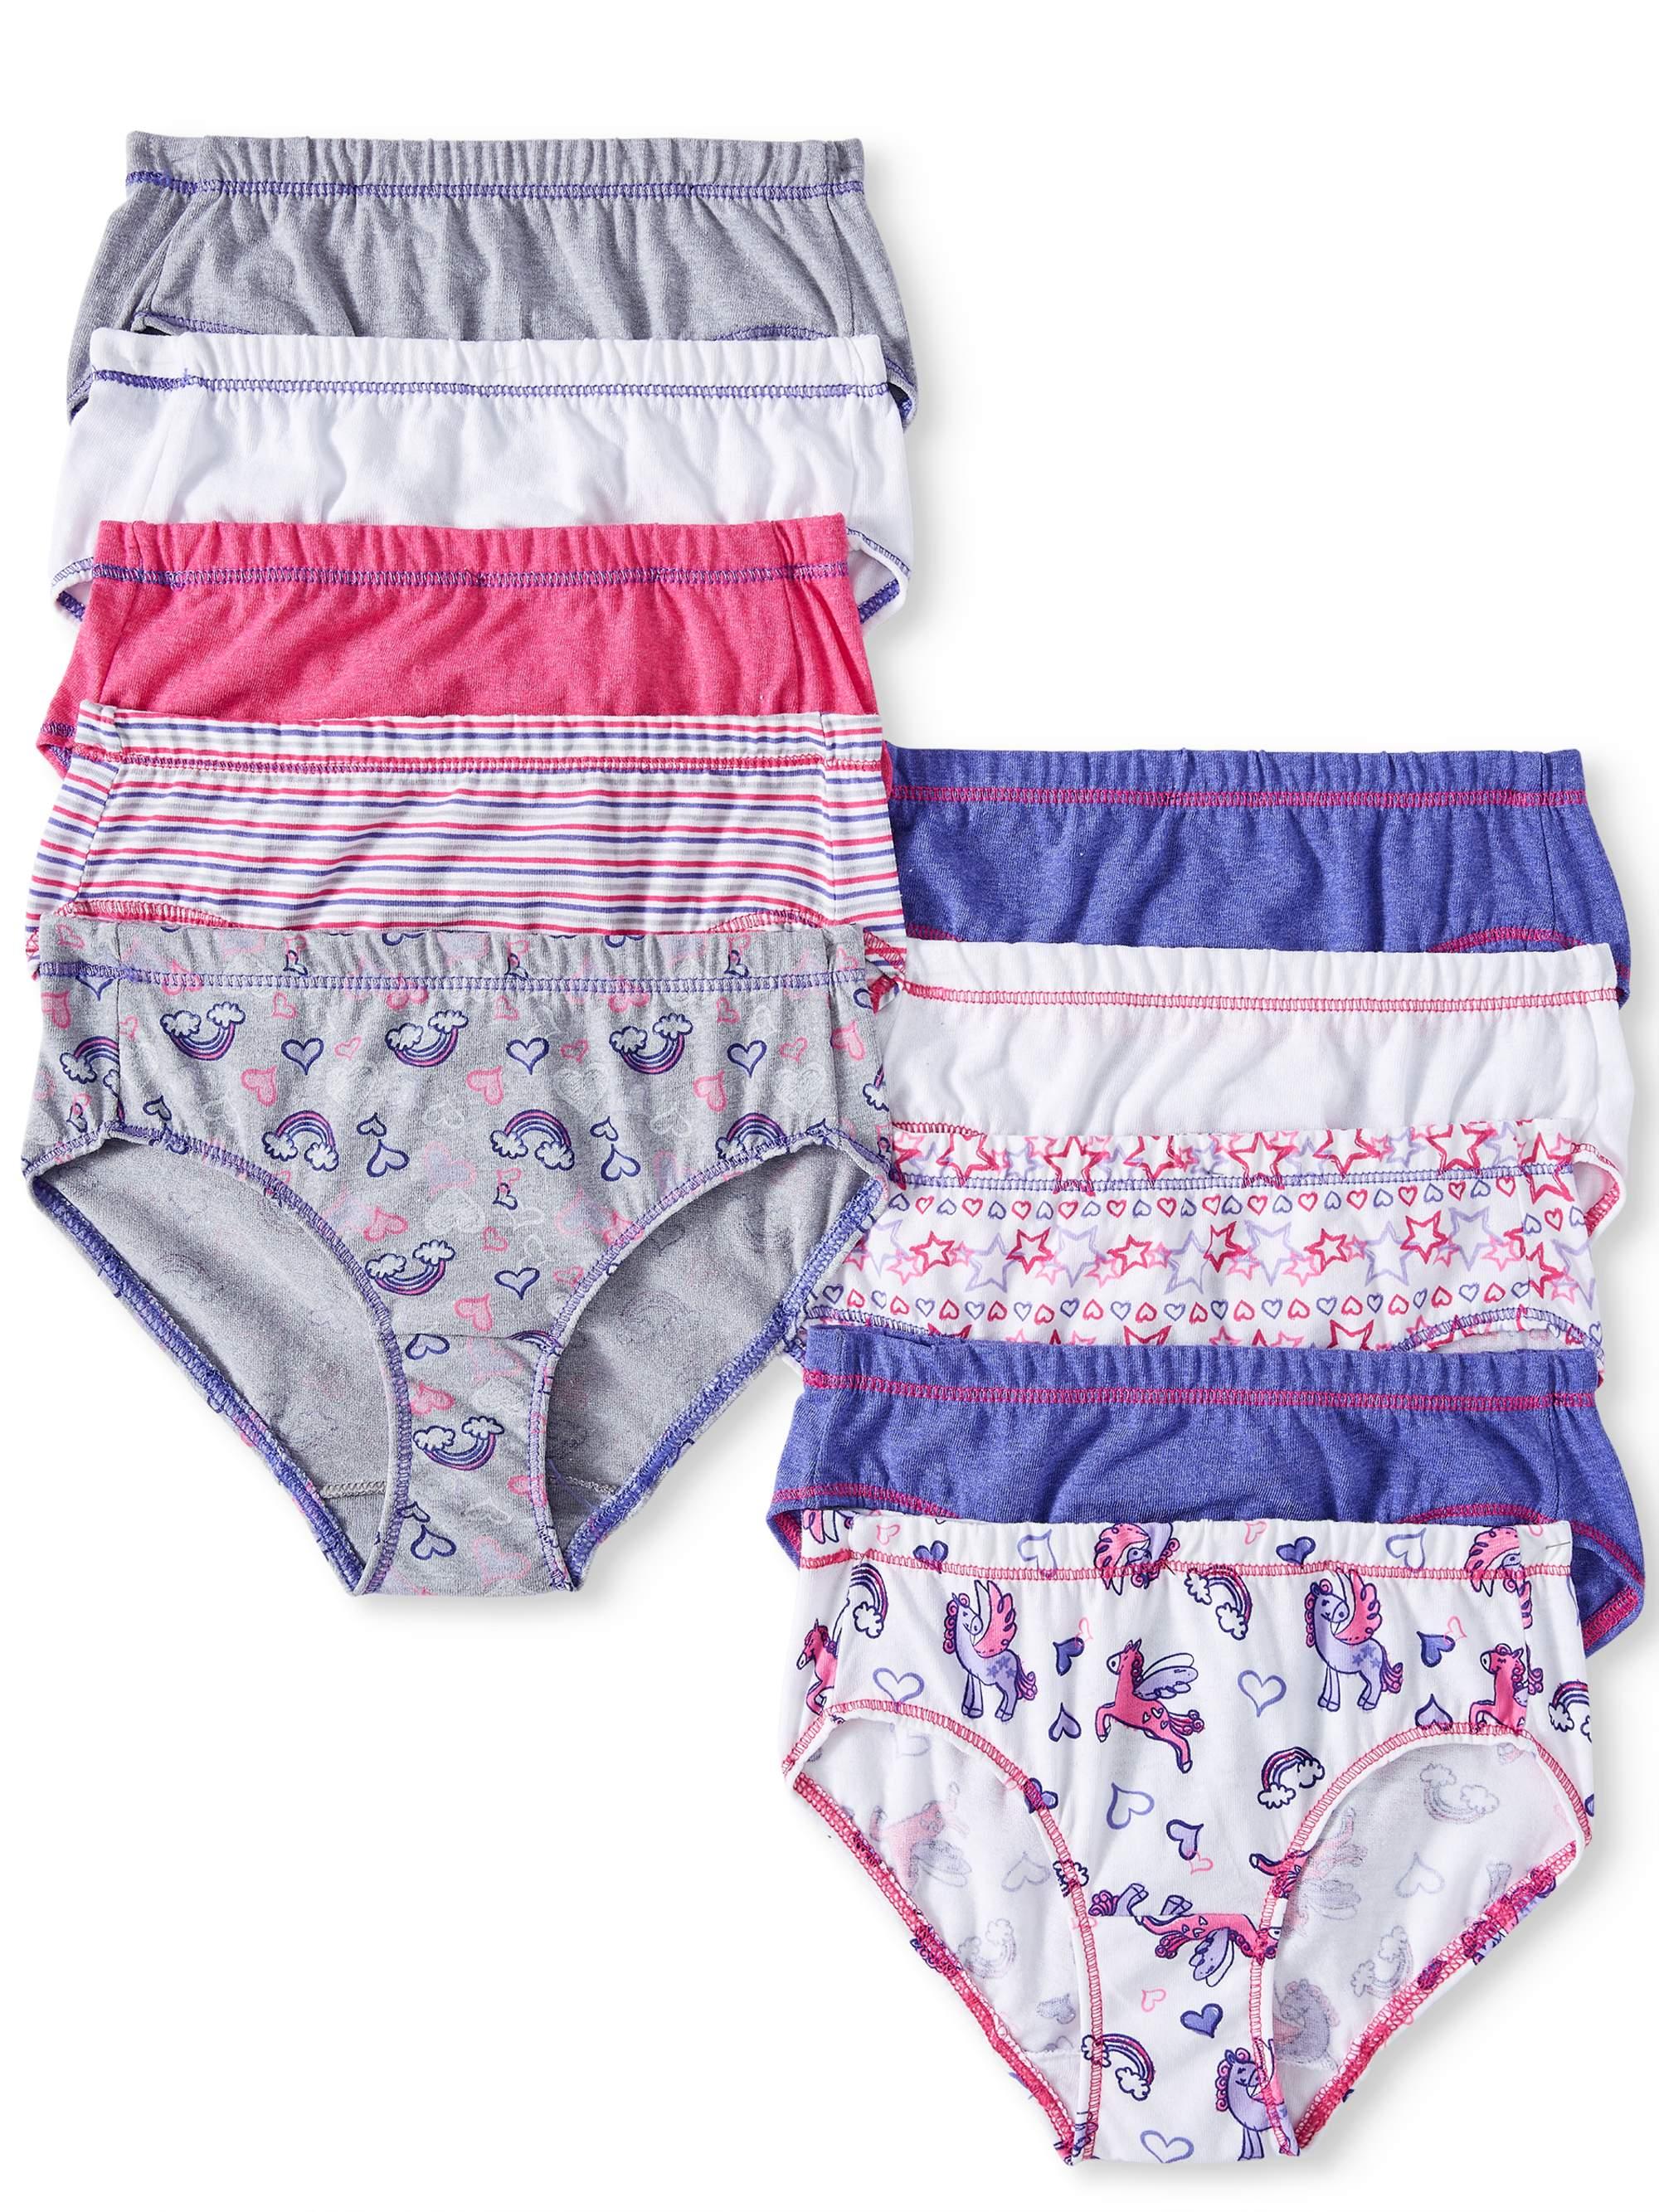 EcoSmart Tagless Hipsters, 10 Pack (Toddler Girls)